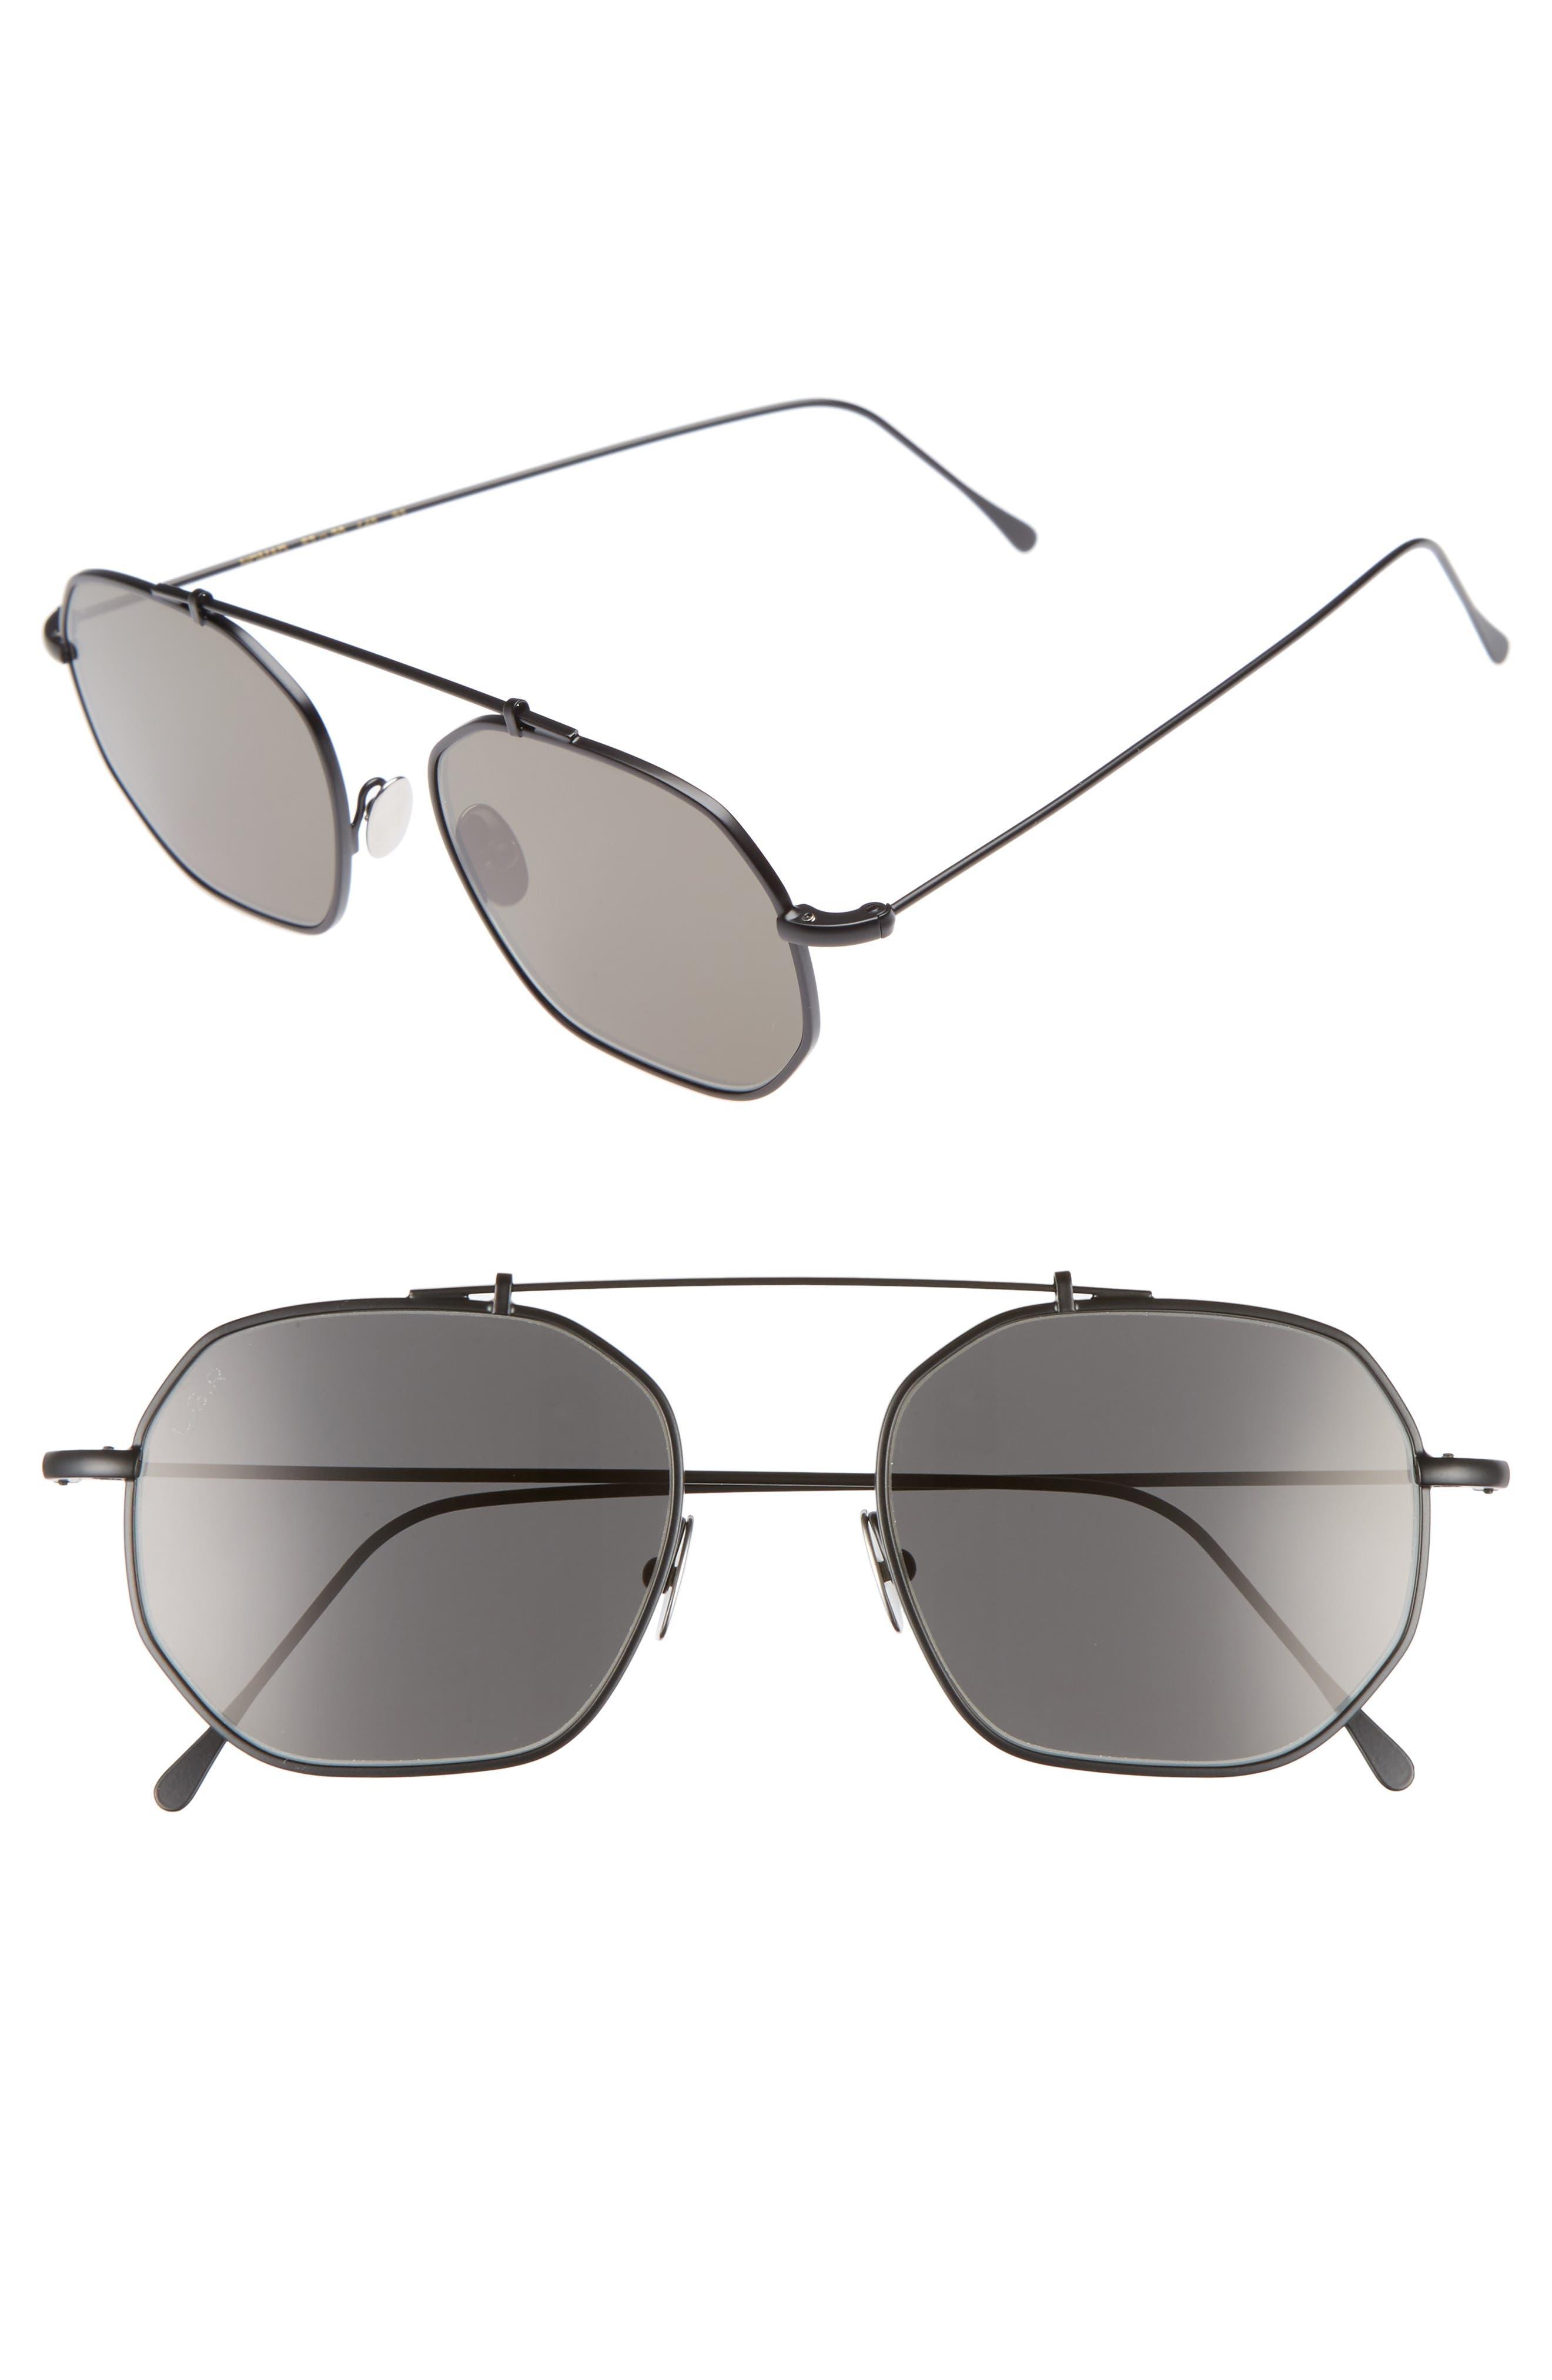 Nomad 52mm Sunglasses,                             Main thumbnail 1, color,                             001